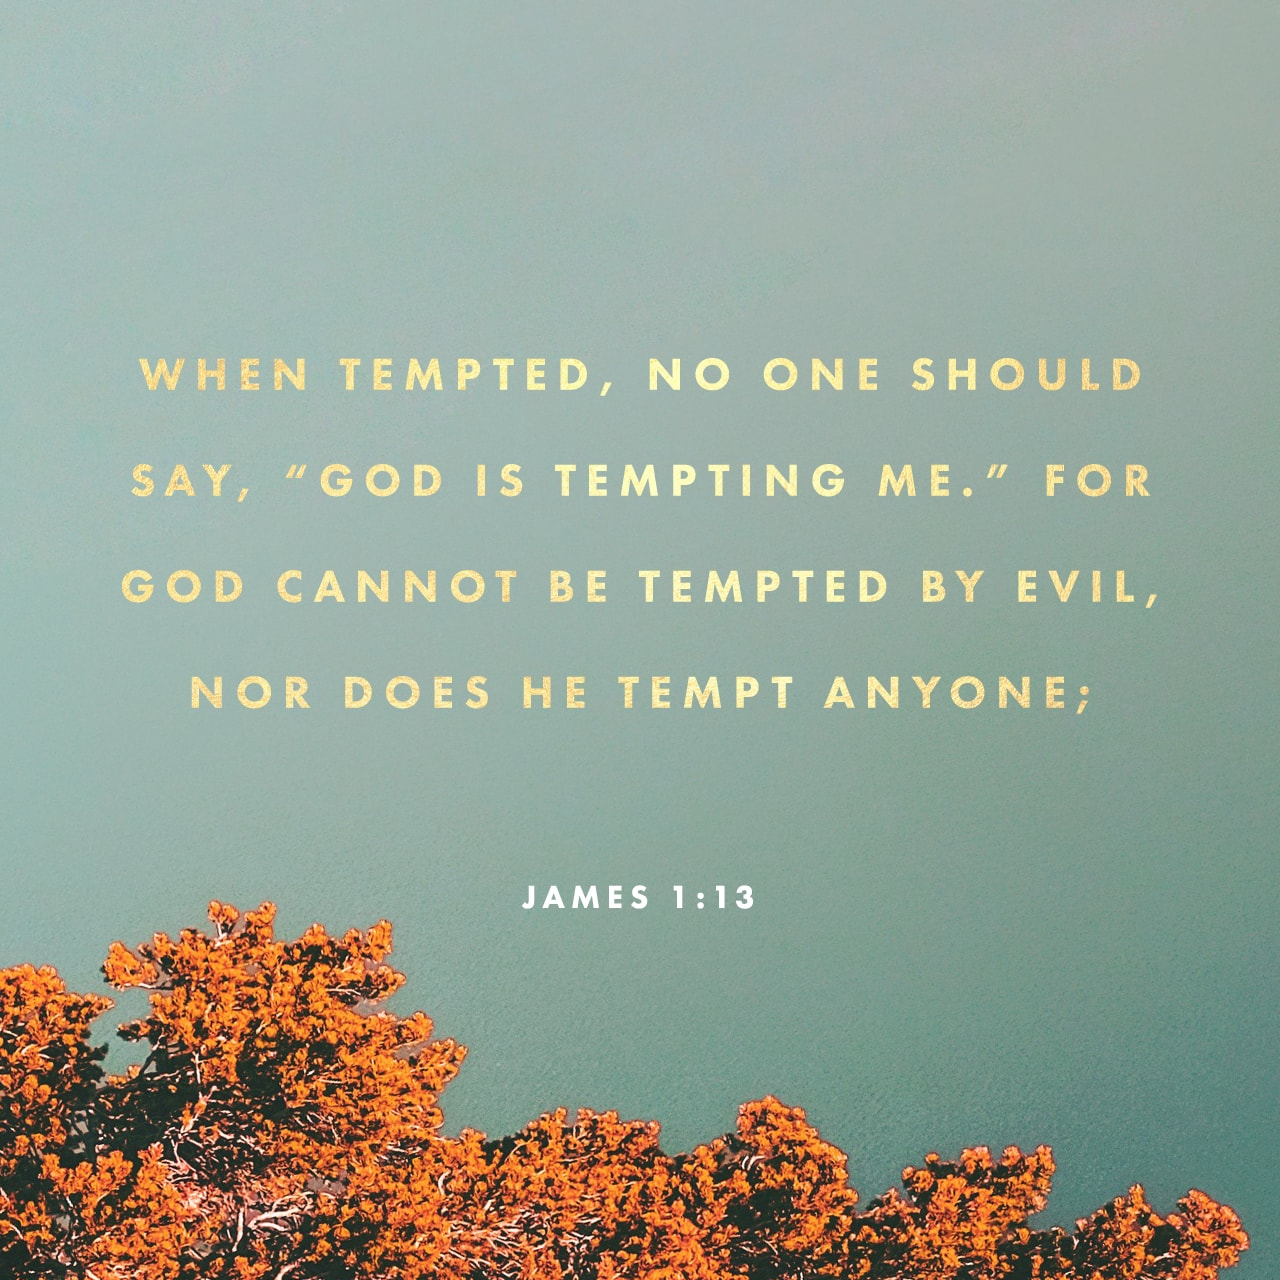 James 1:13